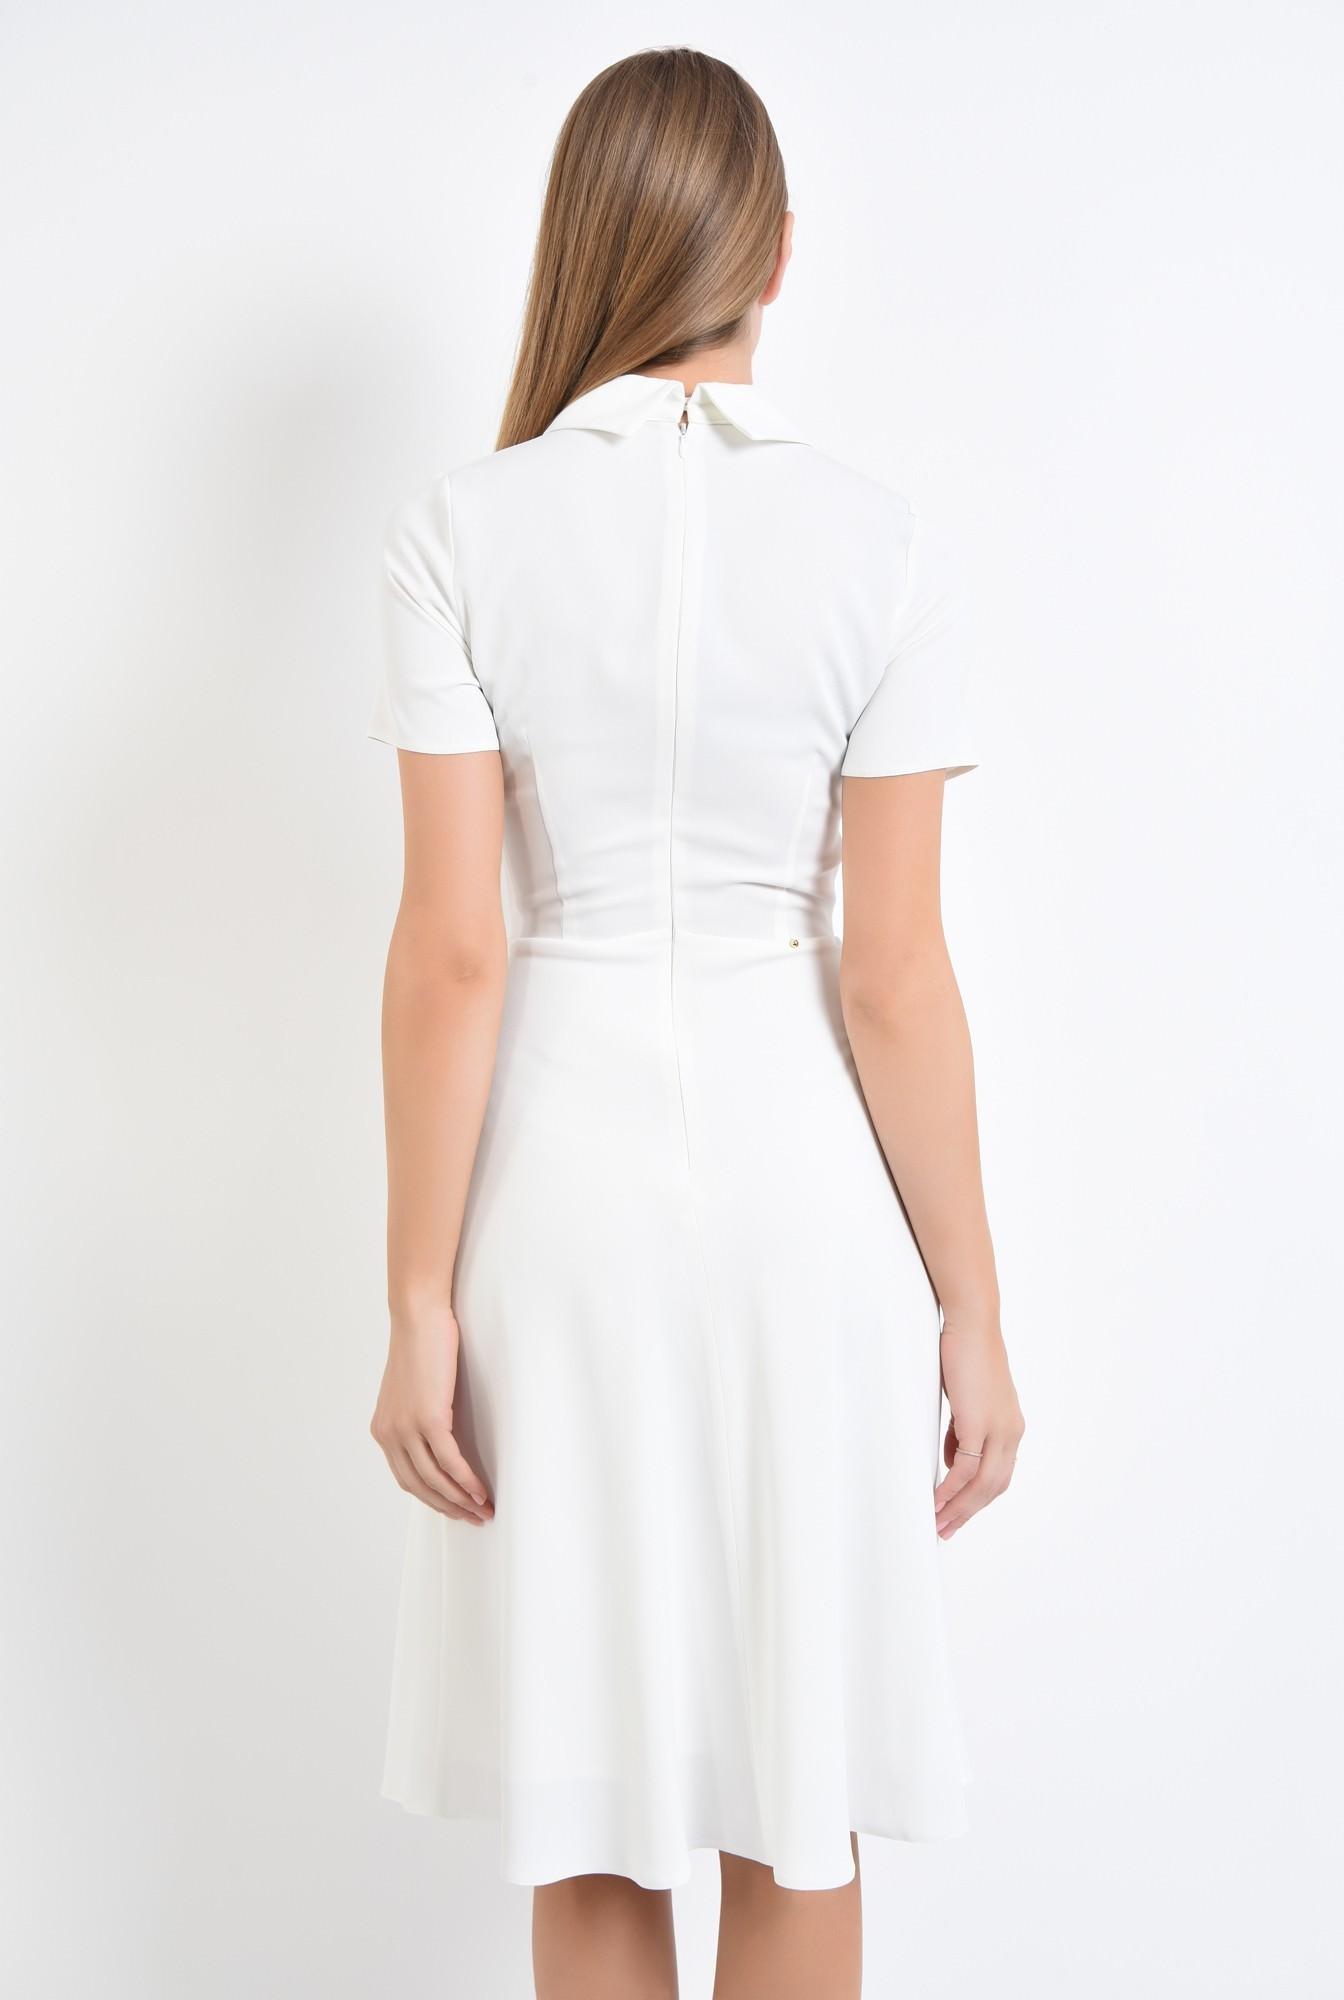 1 - 360 - rochie alba eleganta, bie, lungime medie